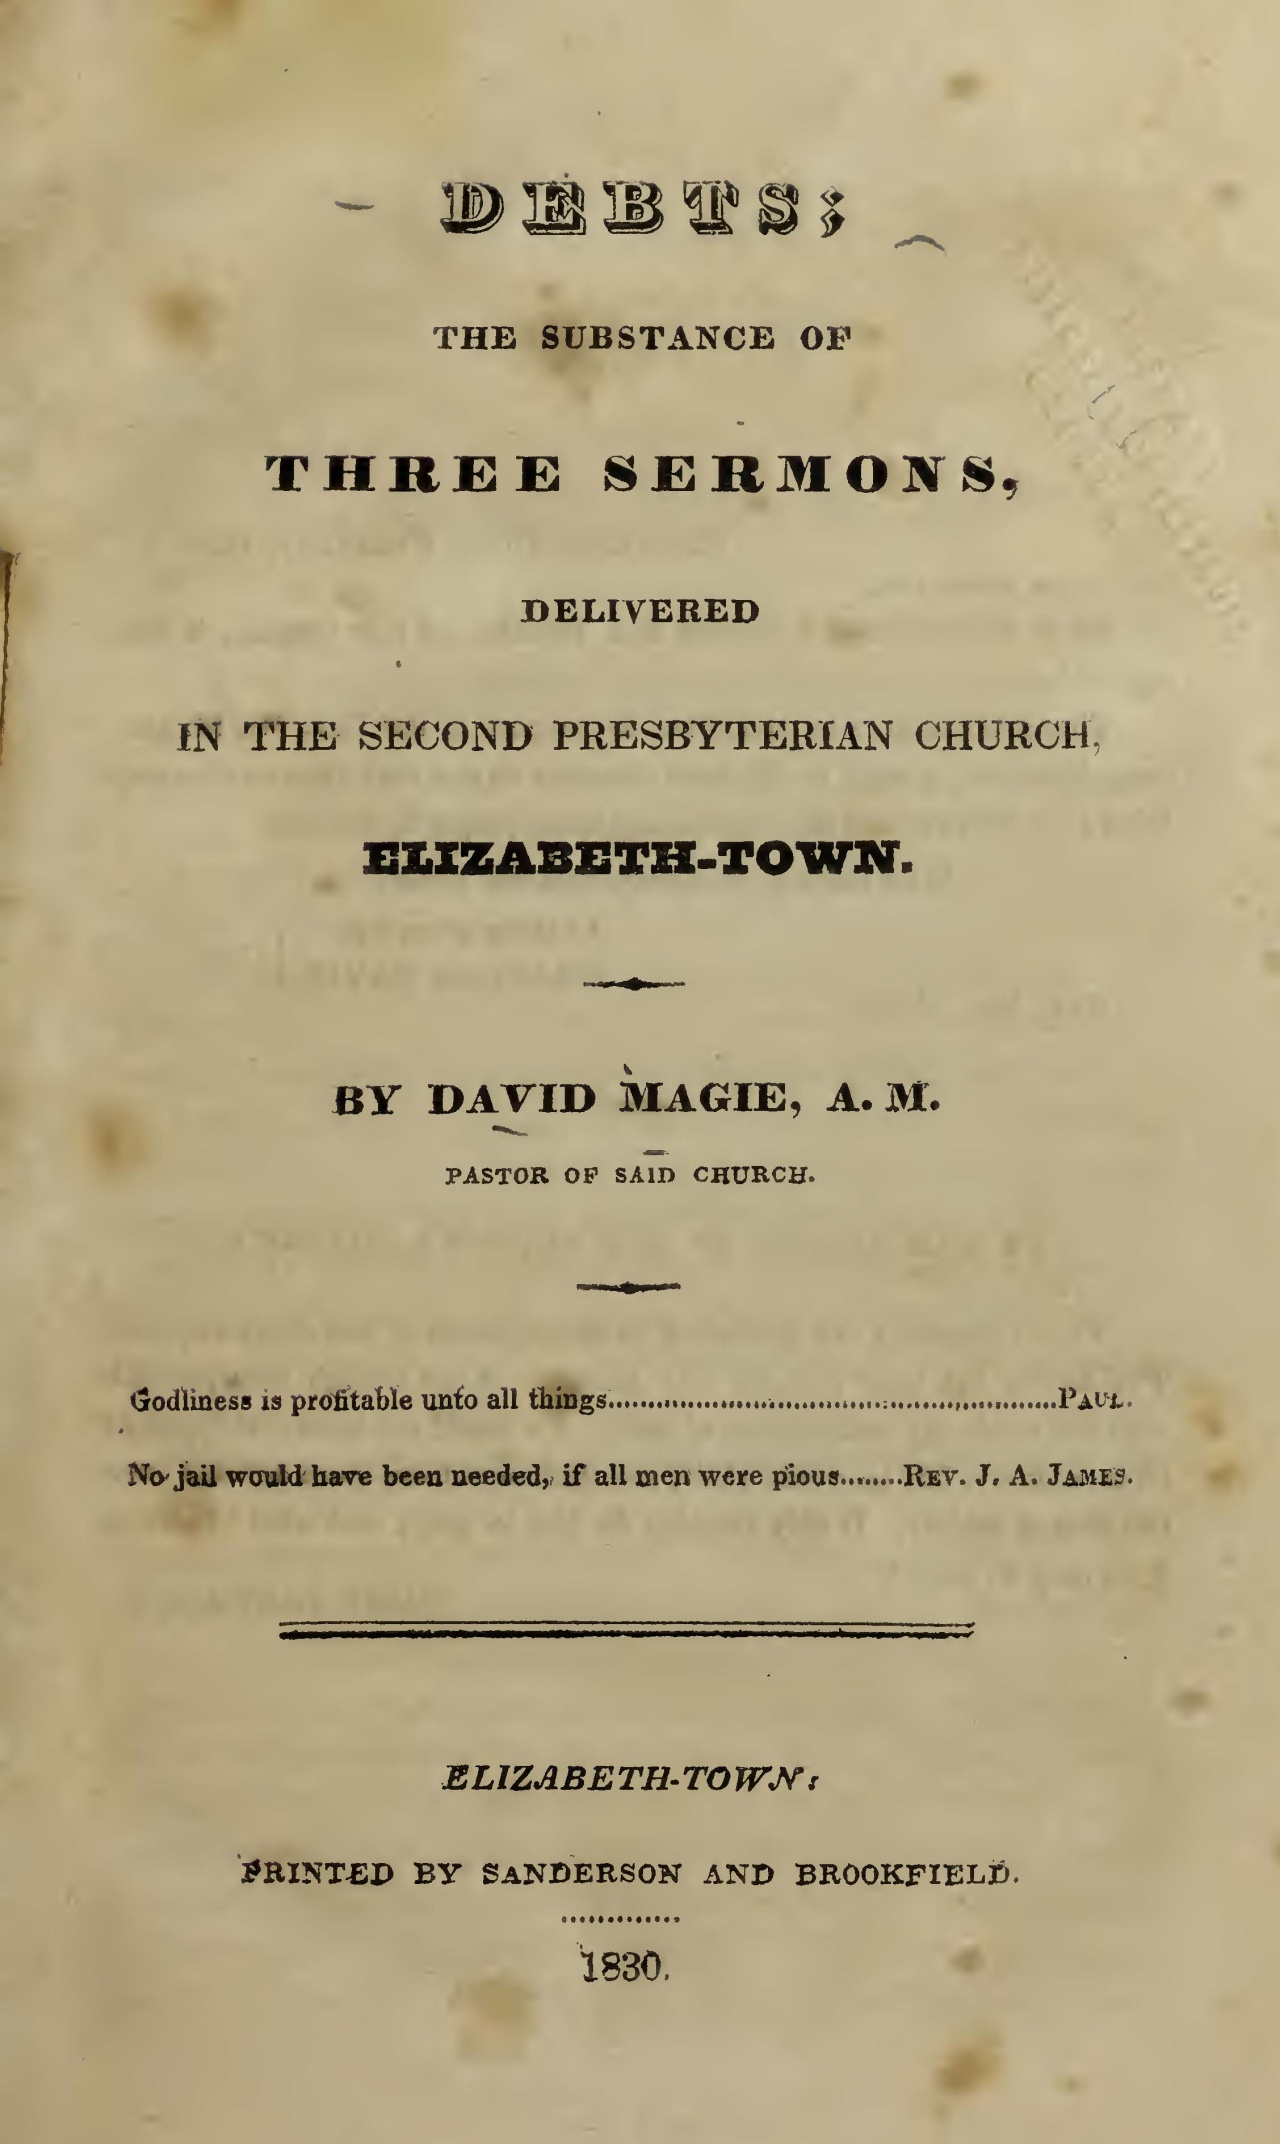 Magie, David, Debts Title Page.jpg